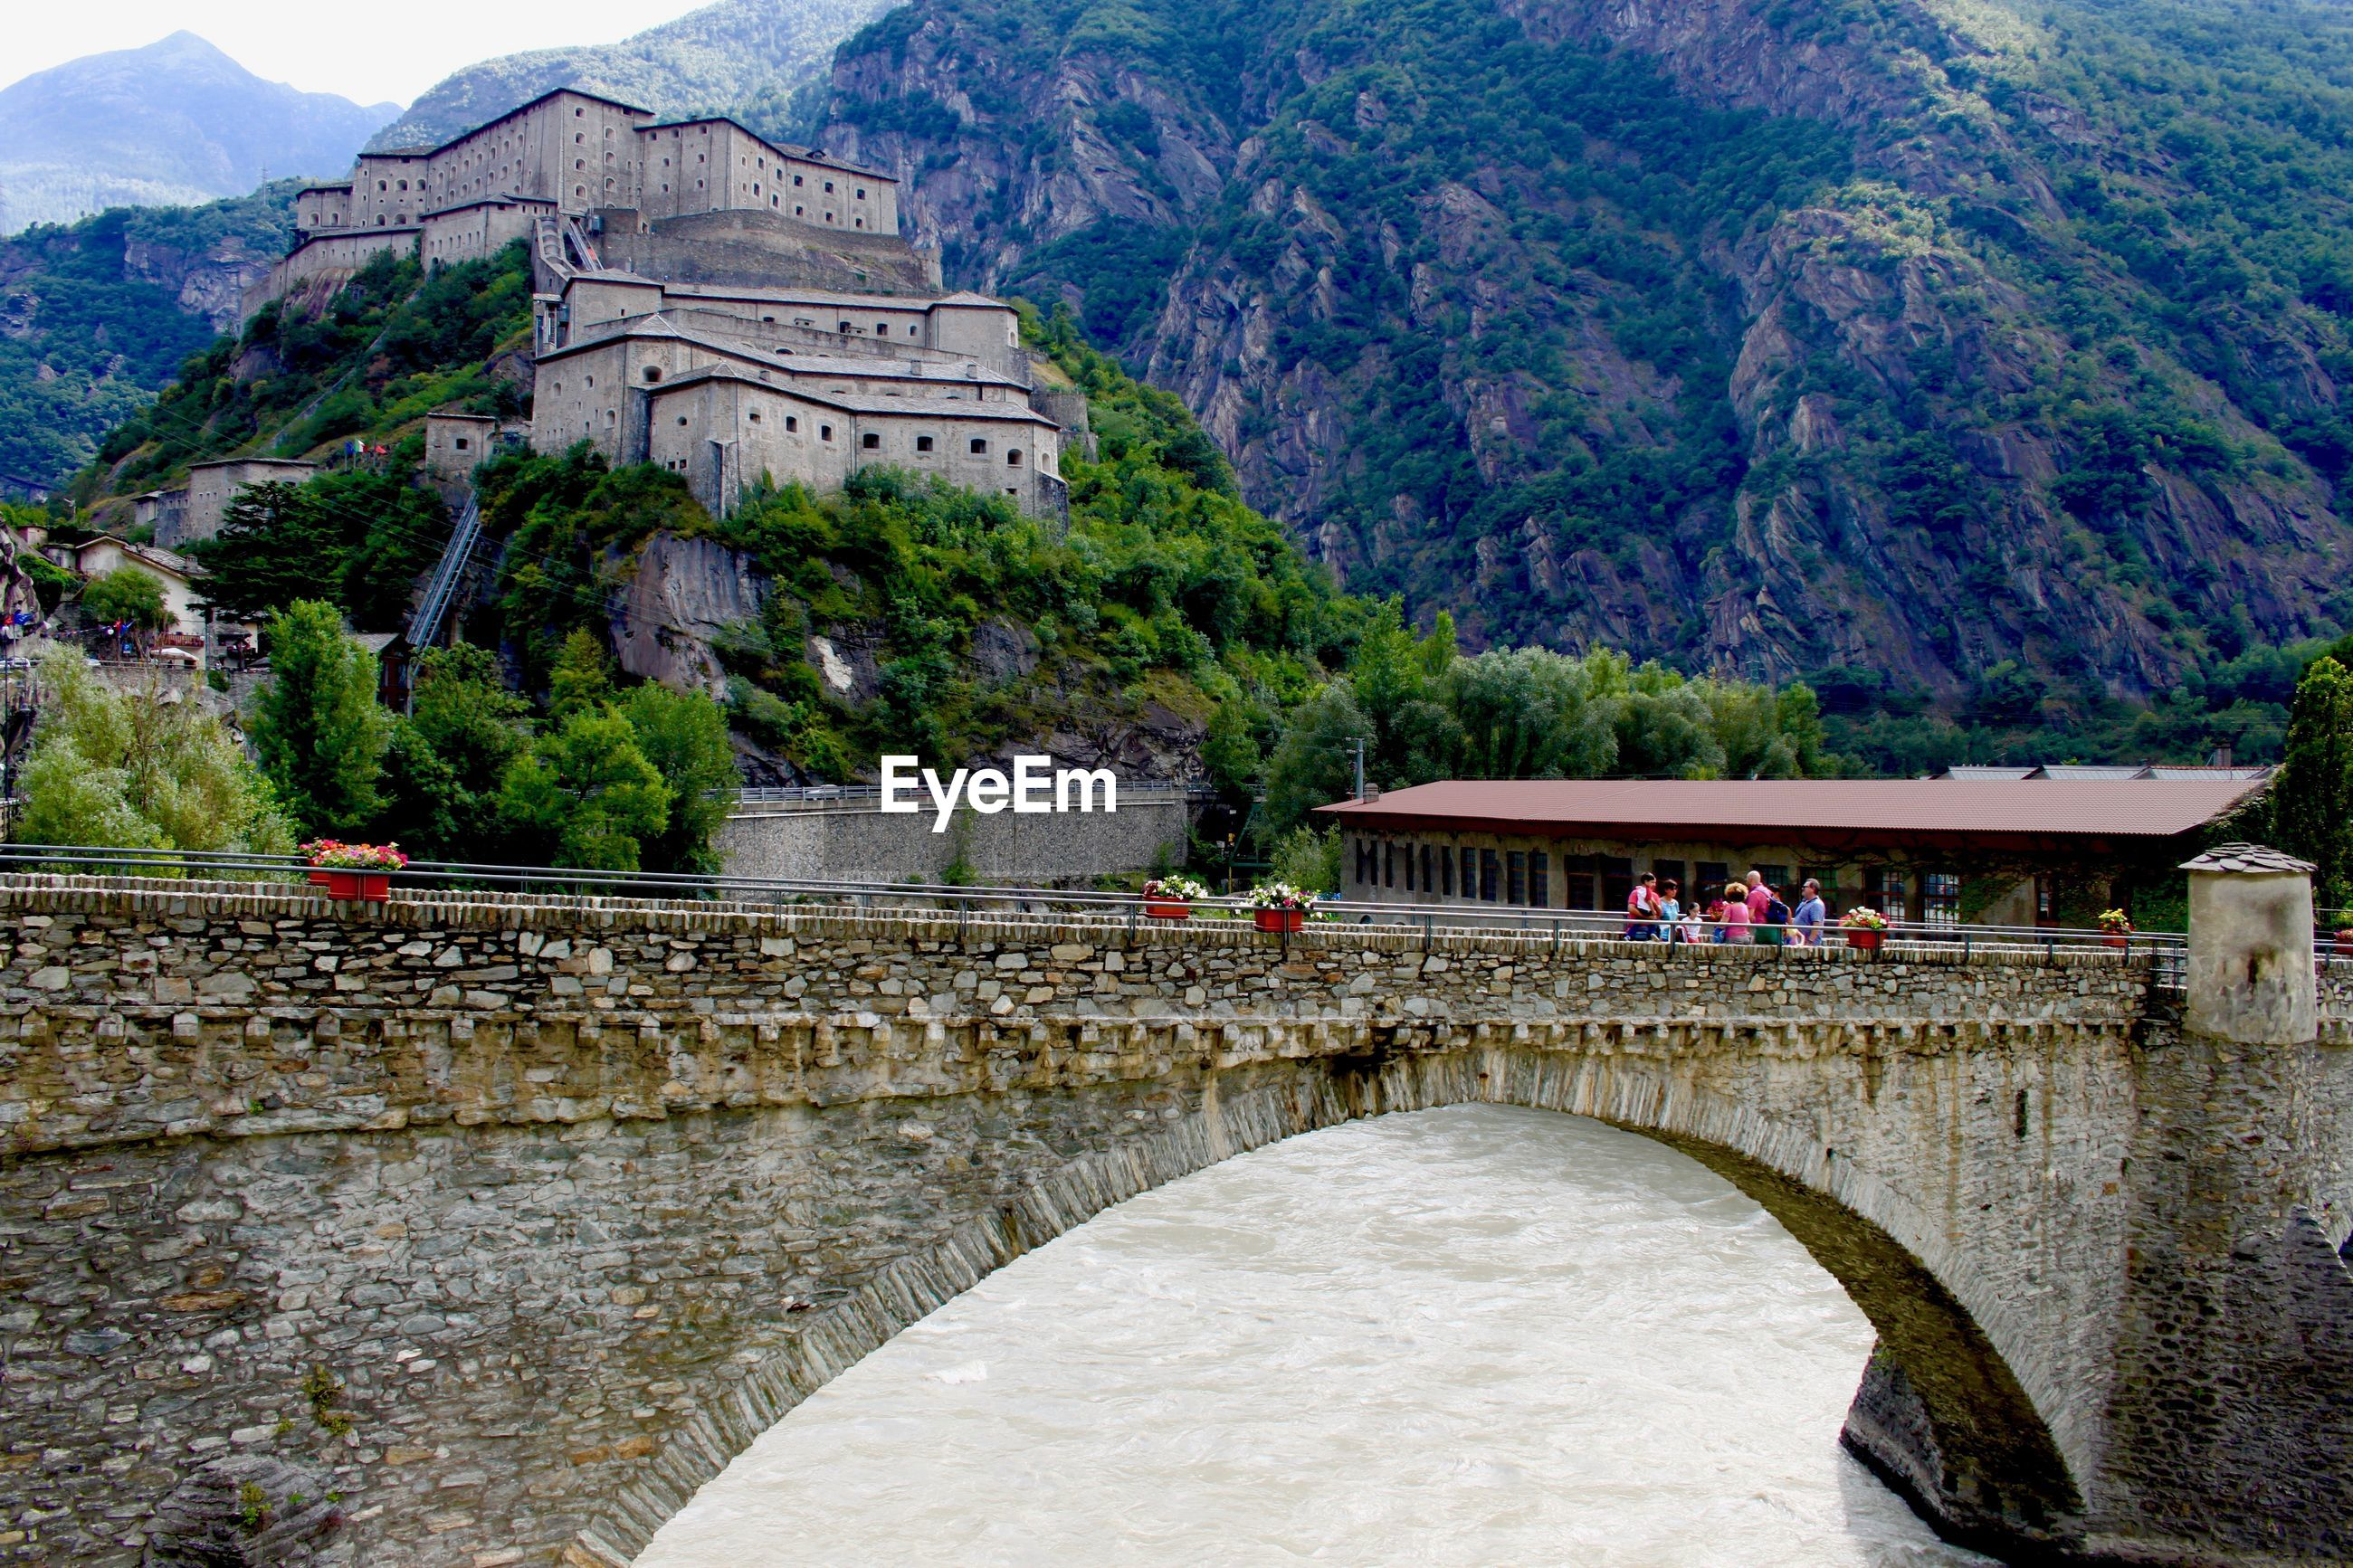 VIEW OF BRIDGE OVER BUILDINGS